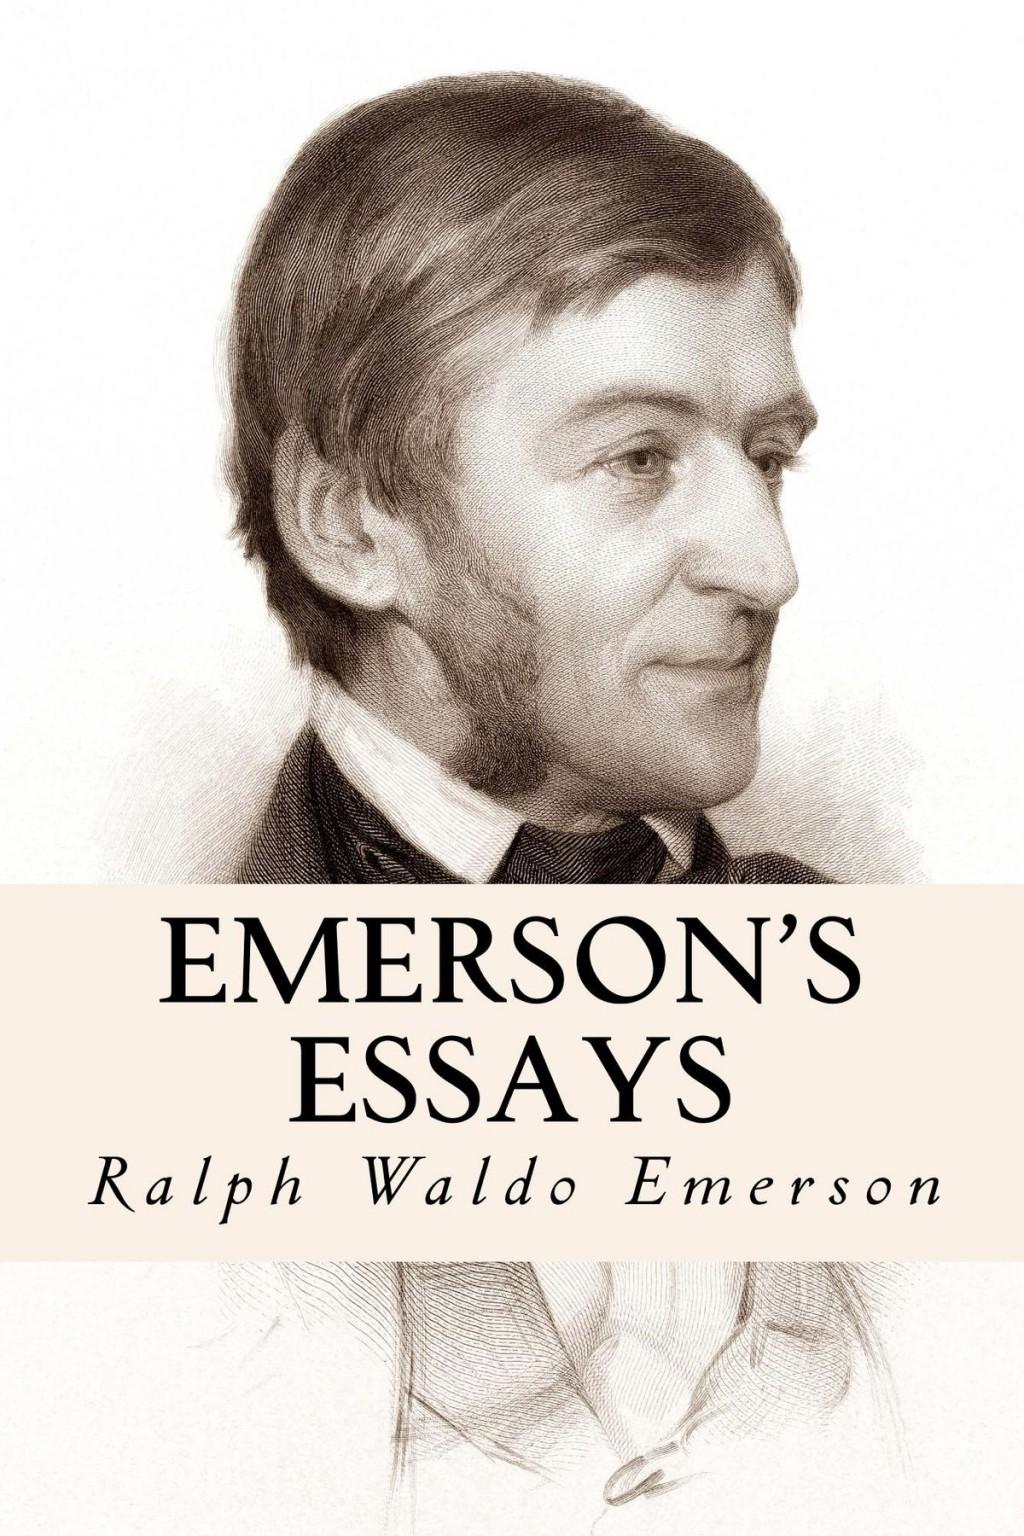 015 Emerson Essays S Essay Dreaded Ralph Pdf First Series Summary Waldo Nature Large